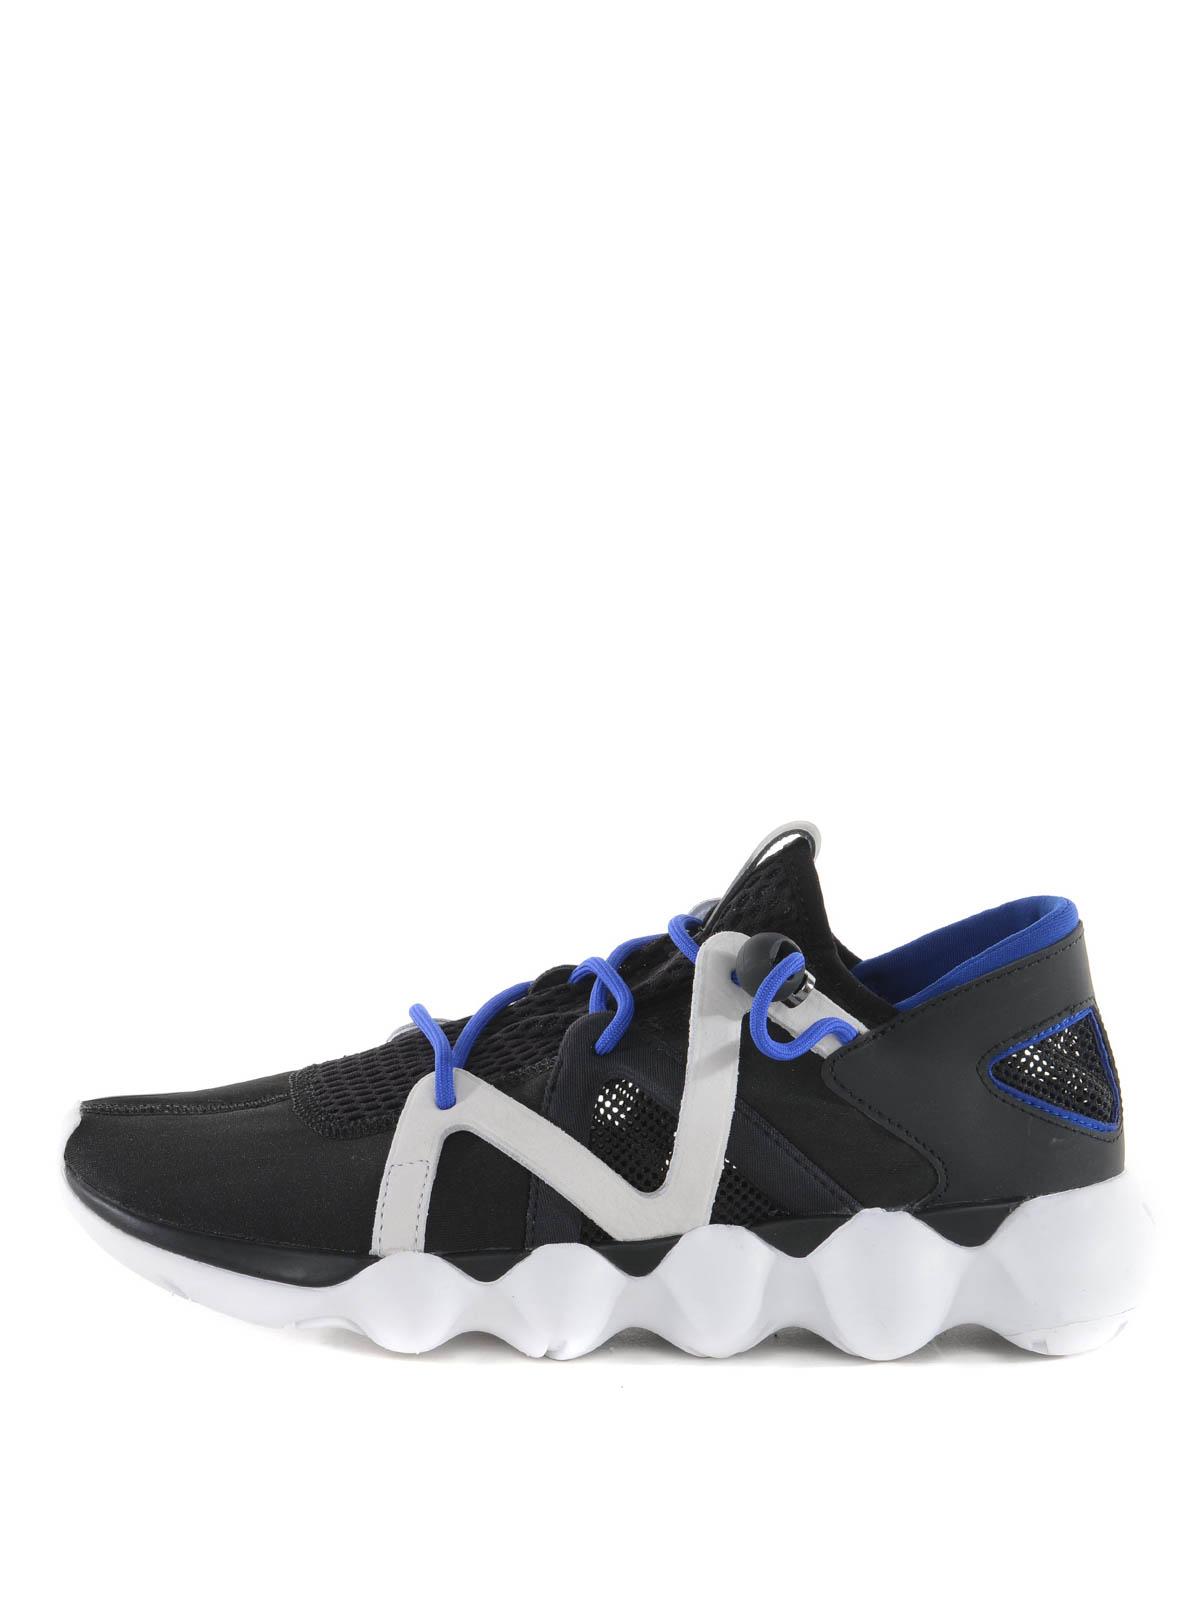 5771e581e30e7 Adidas Y-3 - Kyujo Low sneakers - trainers - AQ5548 BLACK WHITE